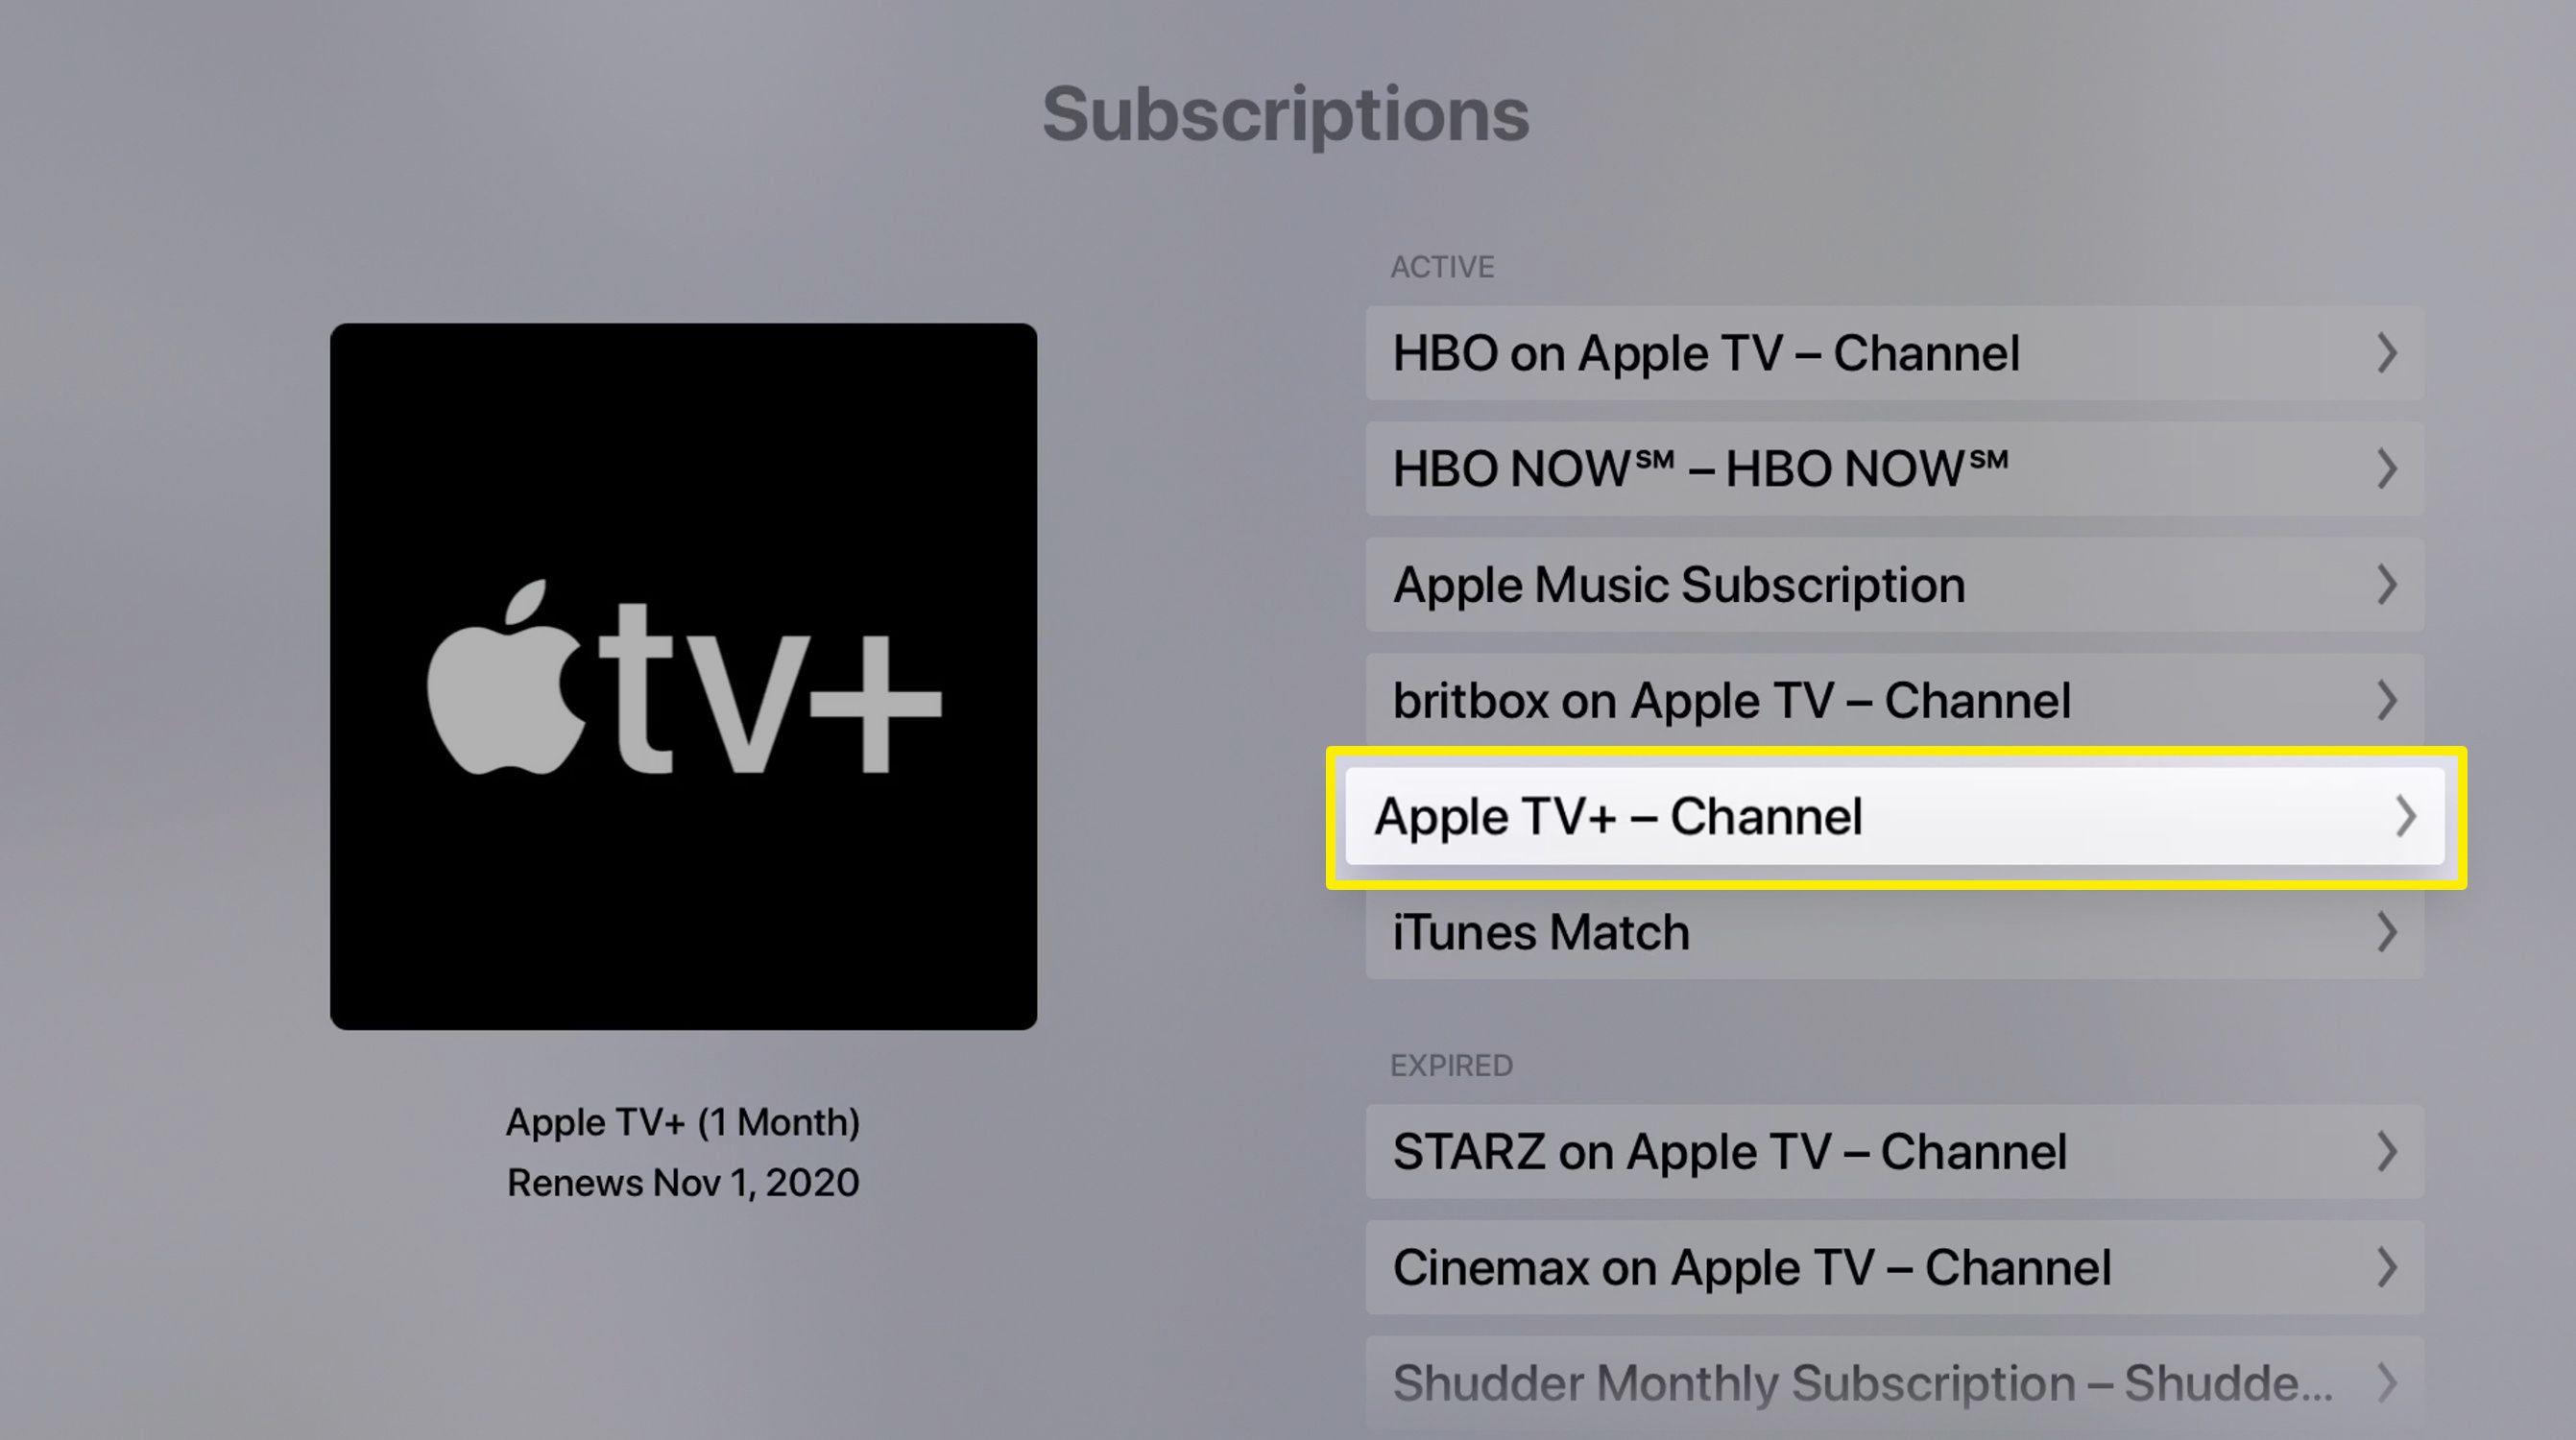 Screenshot of Apple TV subscriptions list